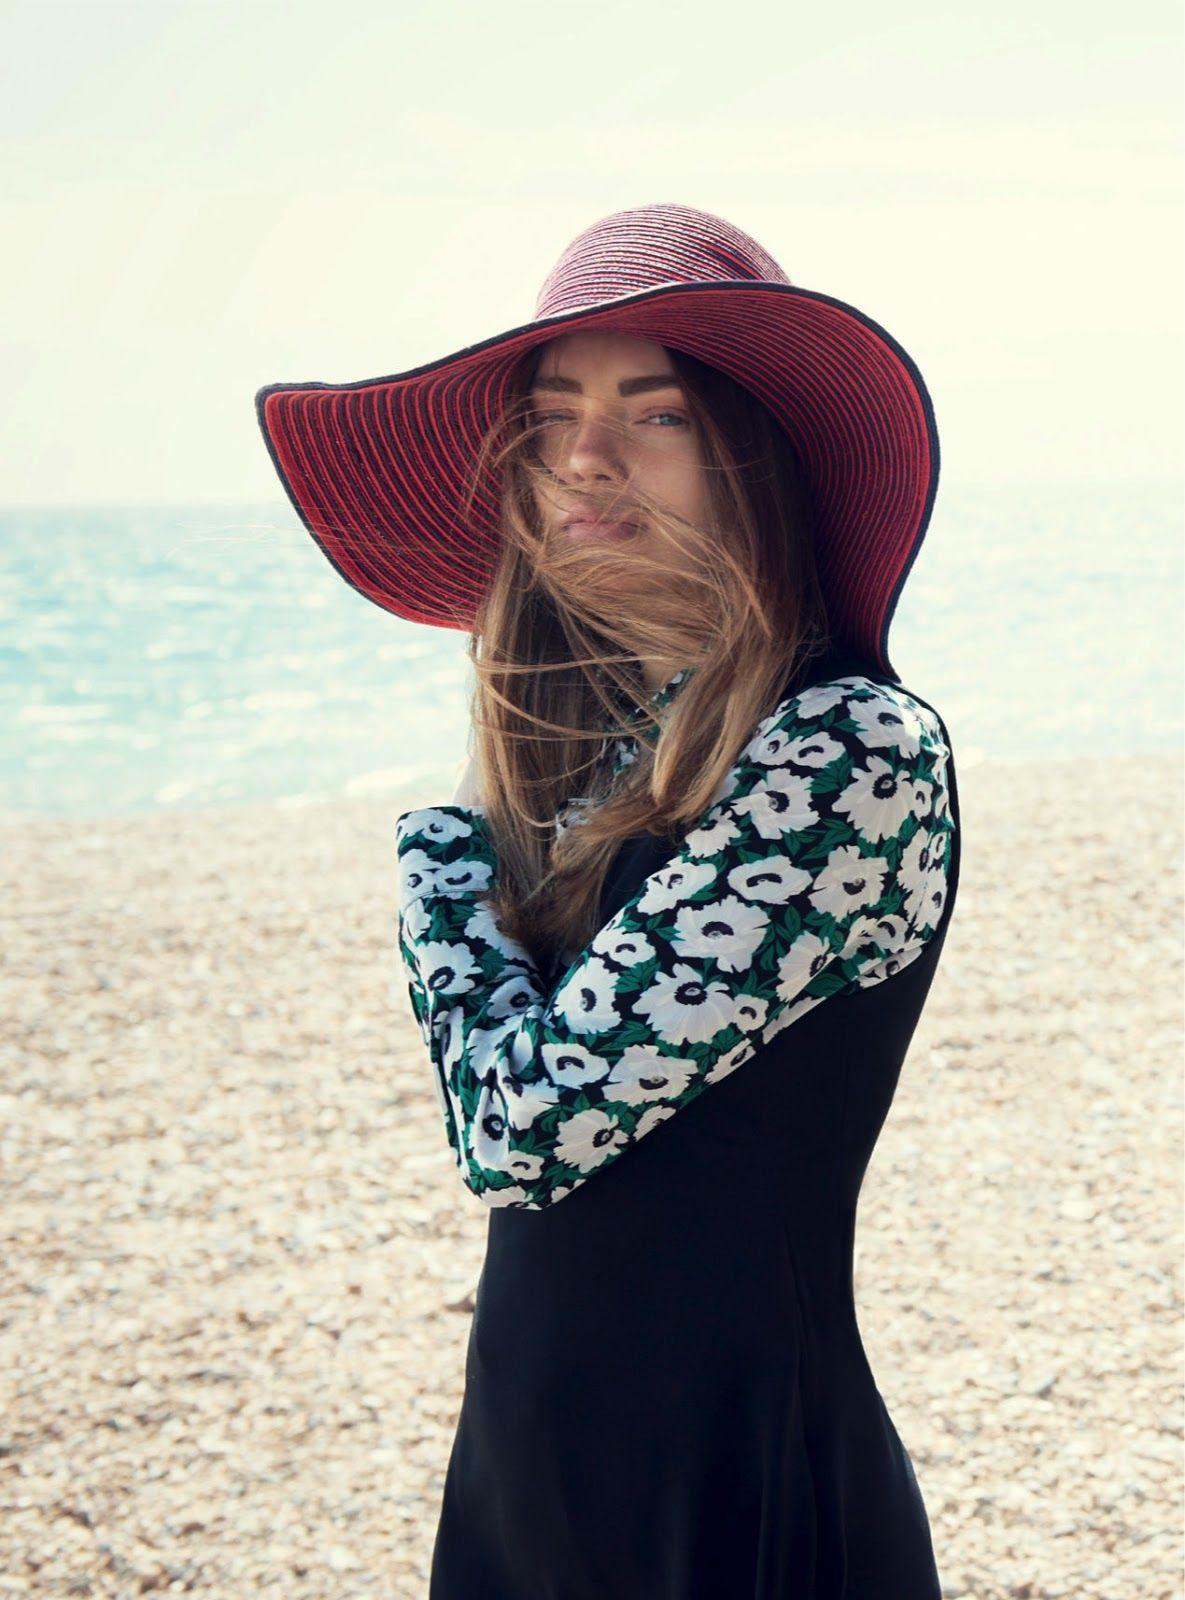 """Beyond the Sea"" Kristine Froseth for Harper's Bazaar UK January 2015"